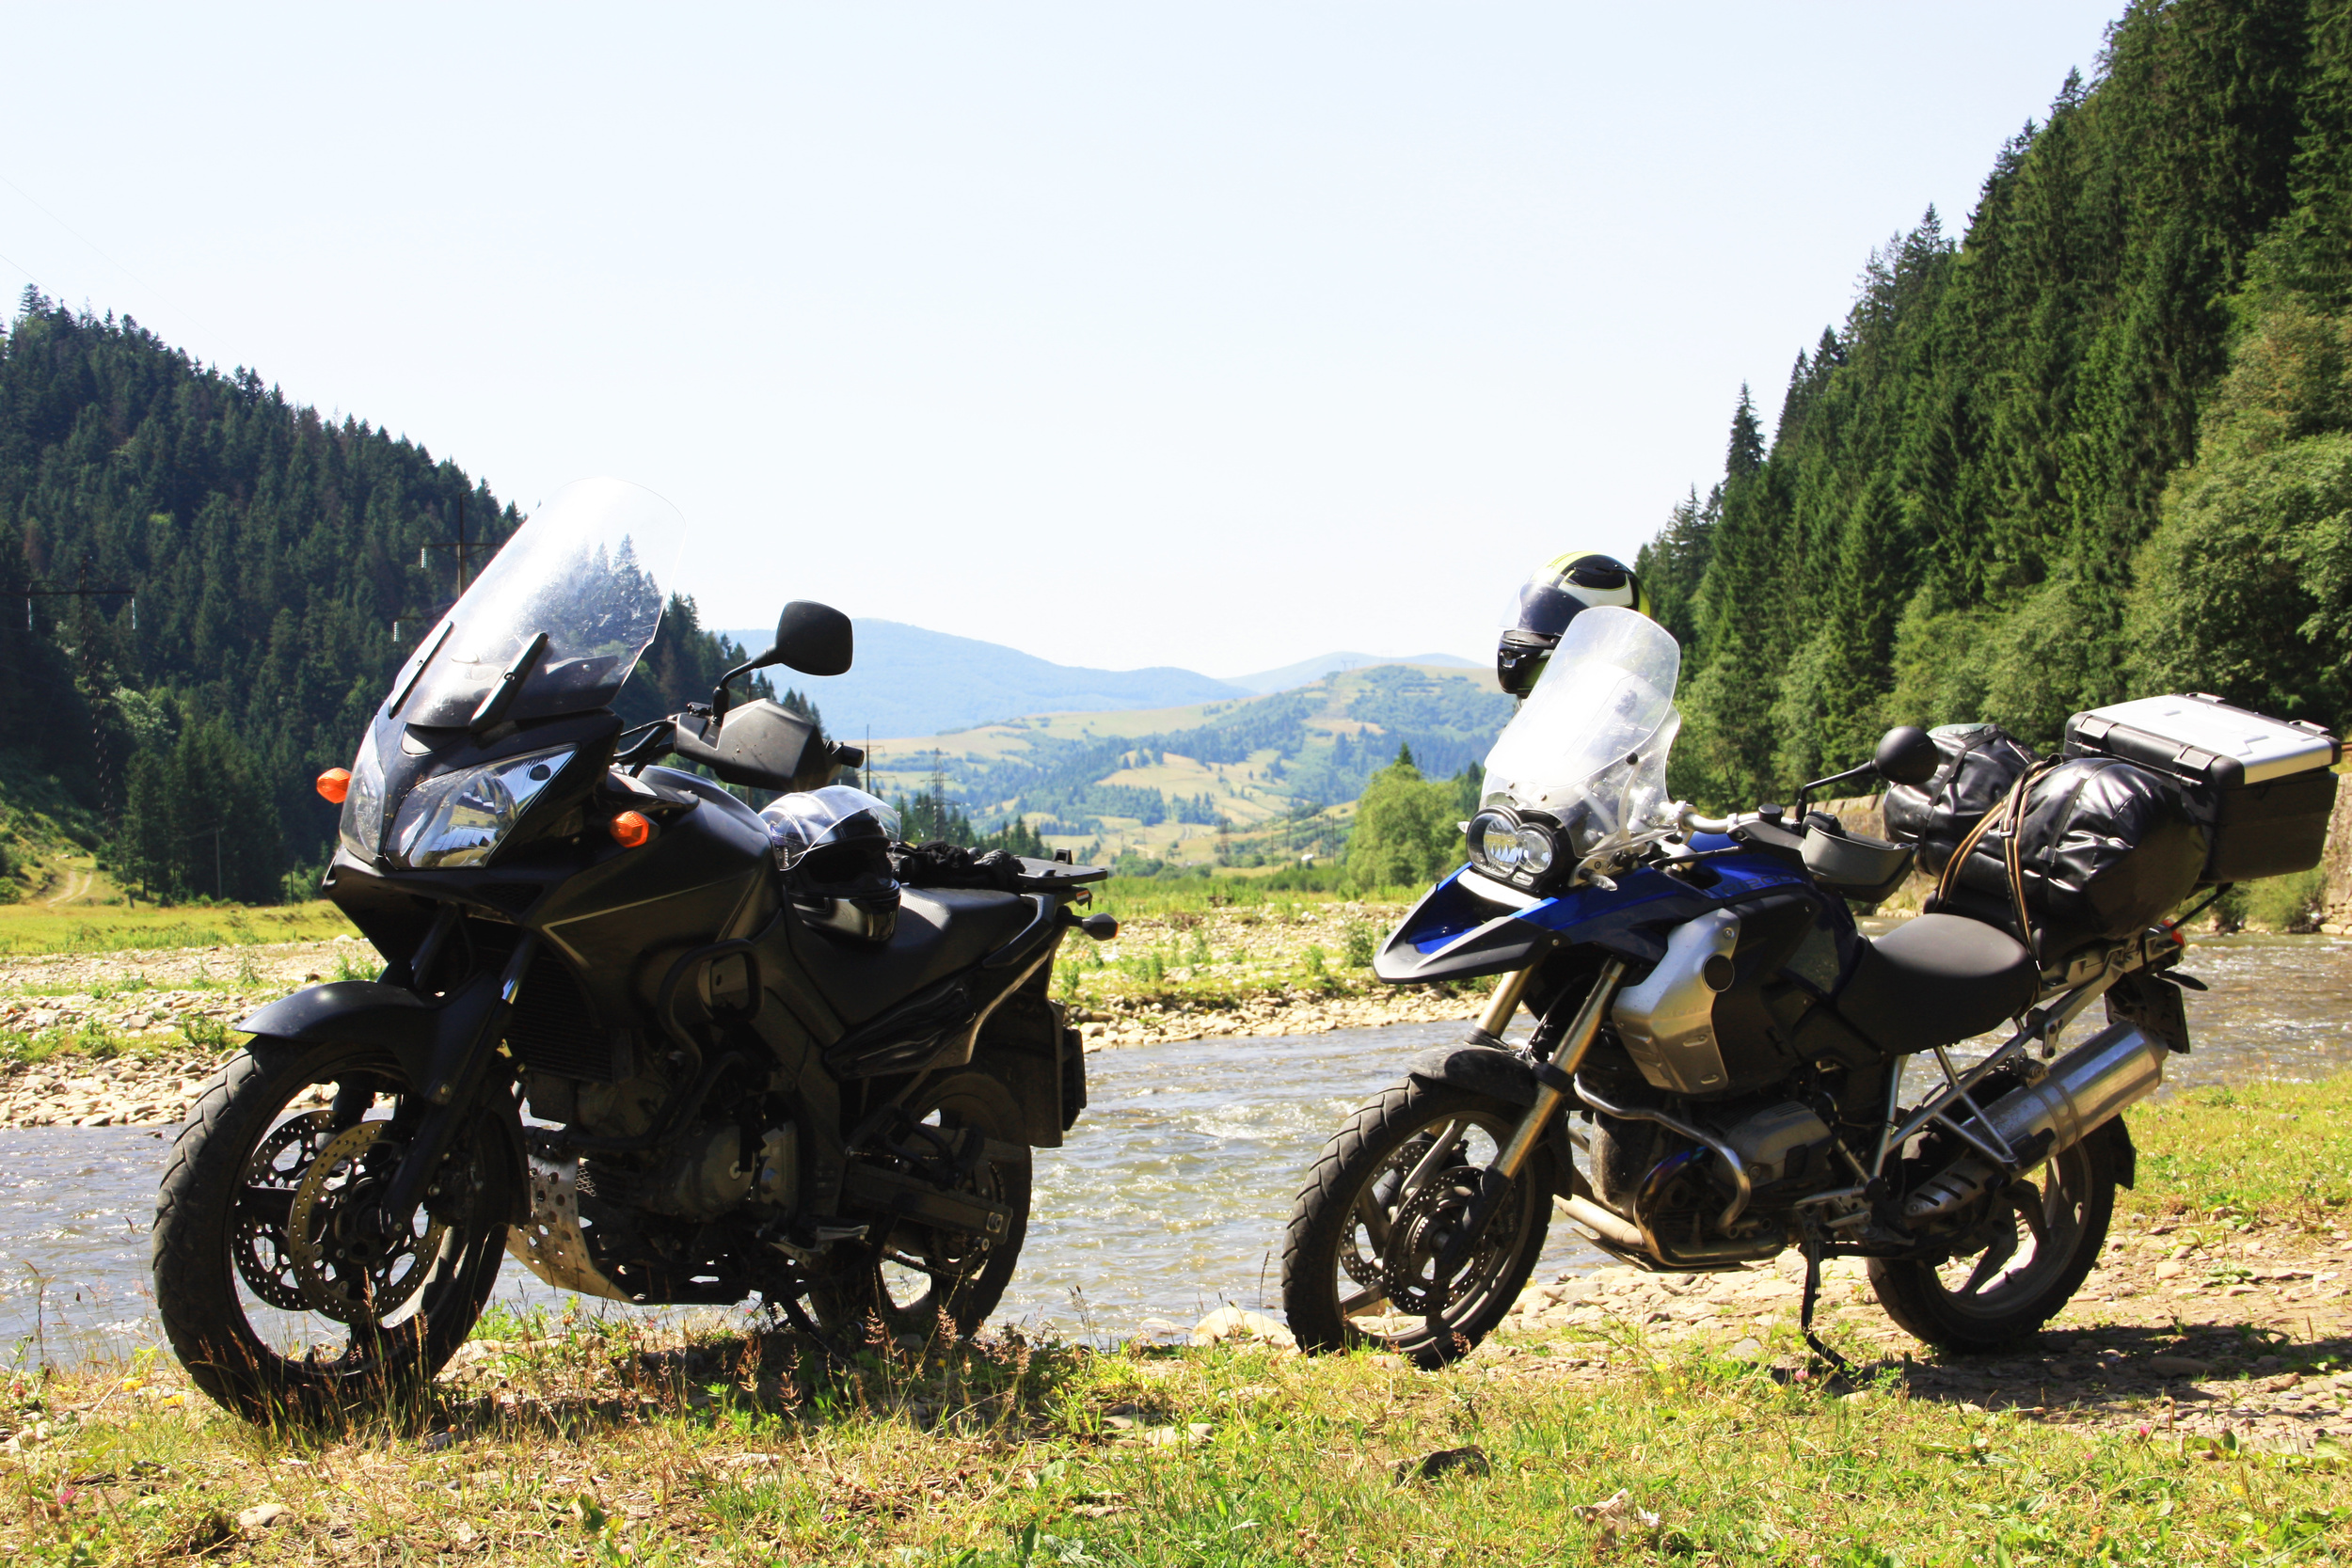 Motorcycling Adventure